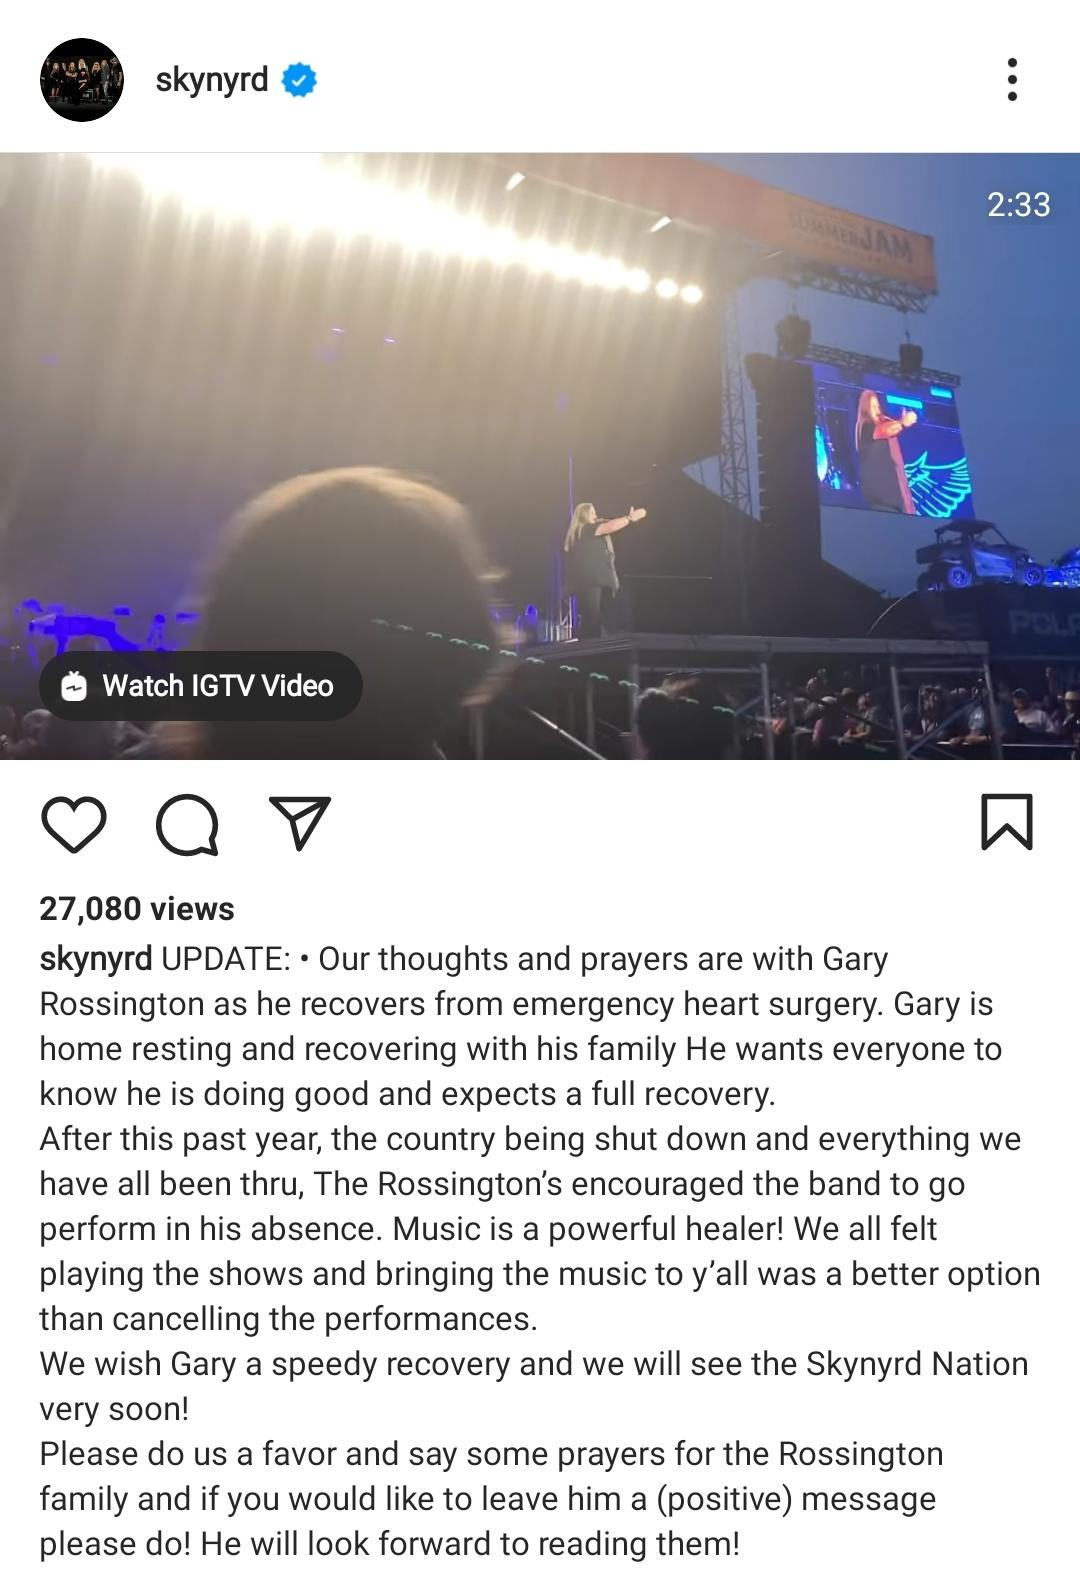 Veteran guitarist Gary Rossington shared an update about his health